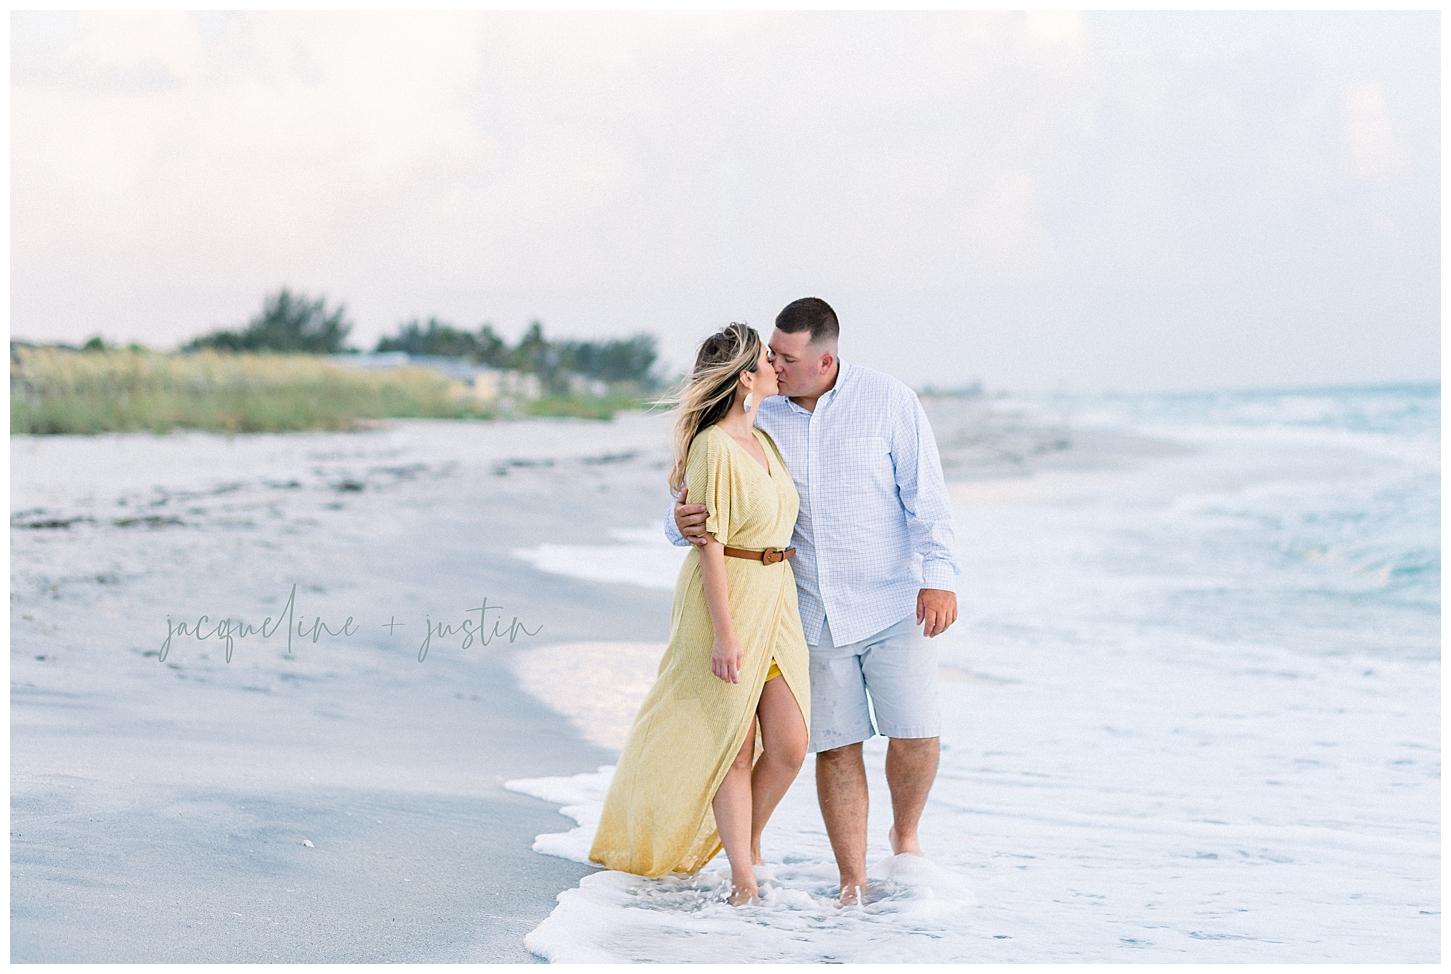 Jacqueline + Justin | Boca Grande, FL